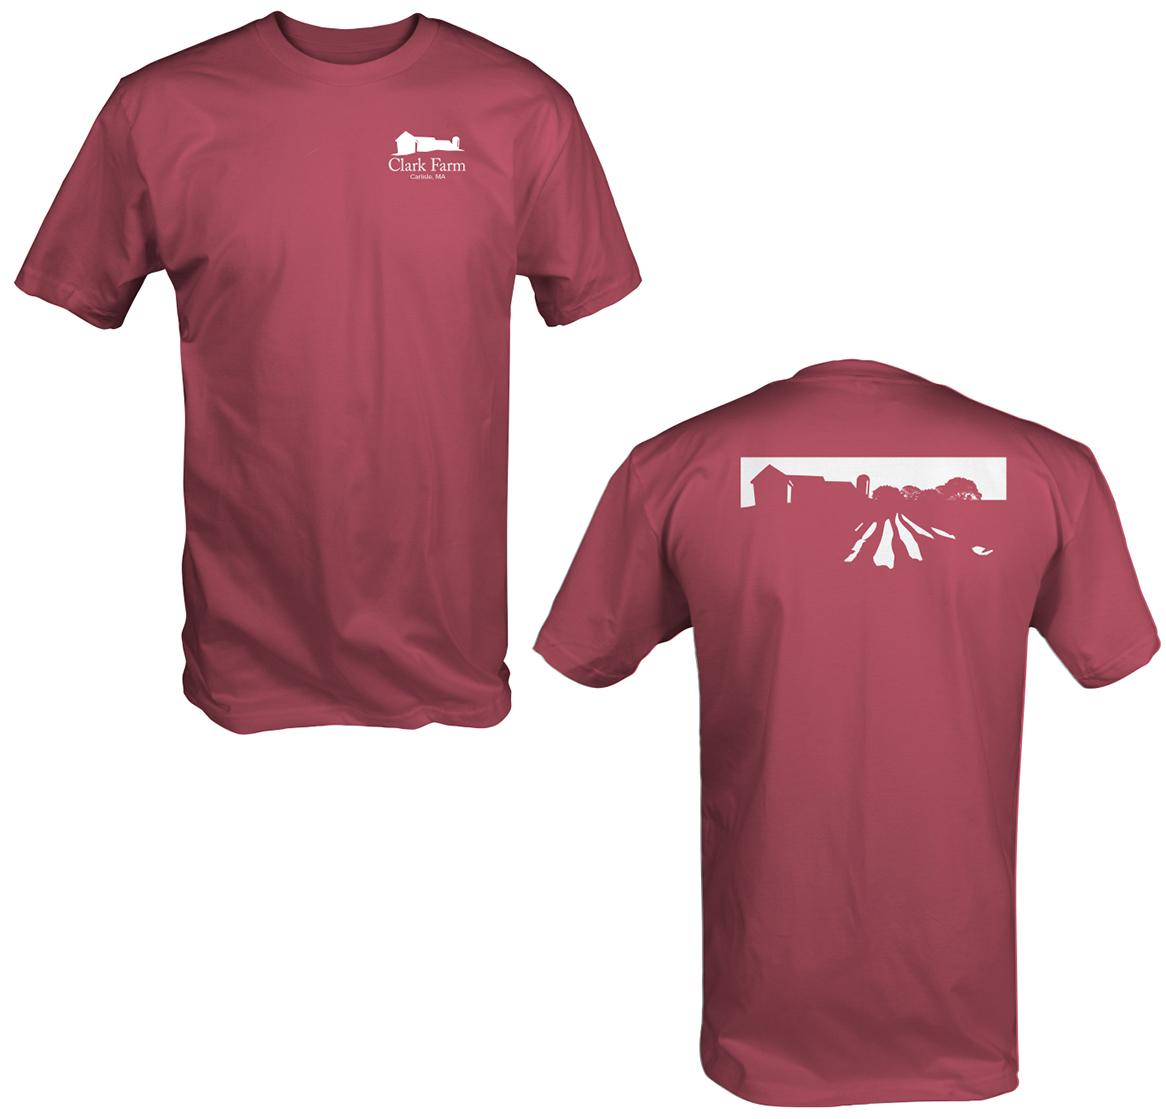 Clark Farm Field Shirt Red